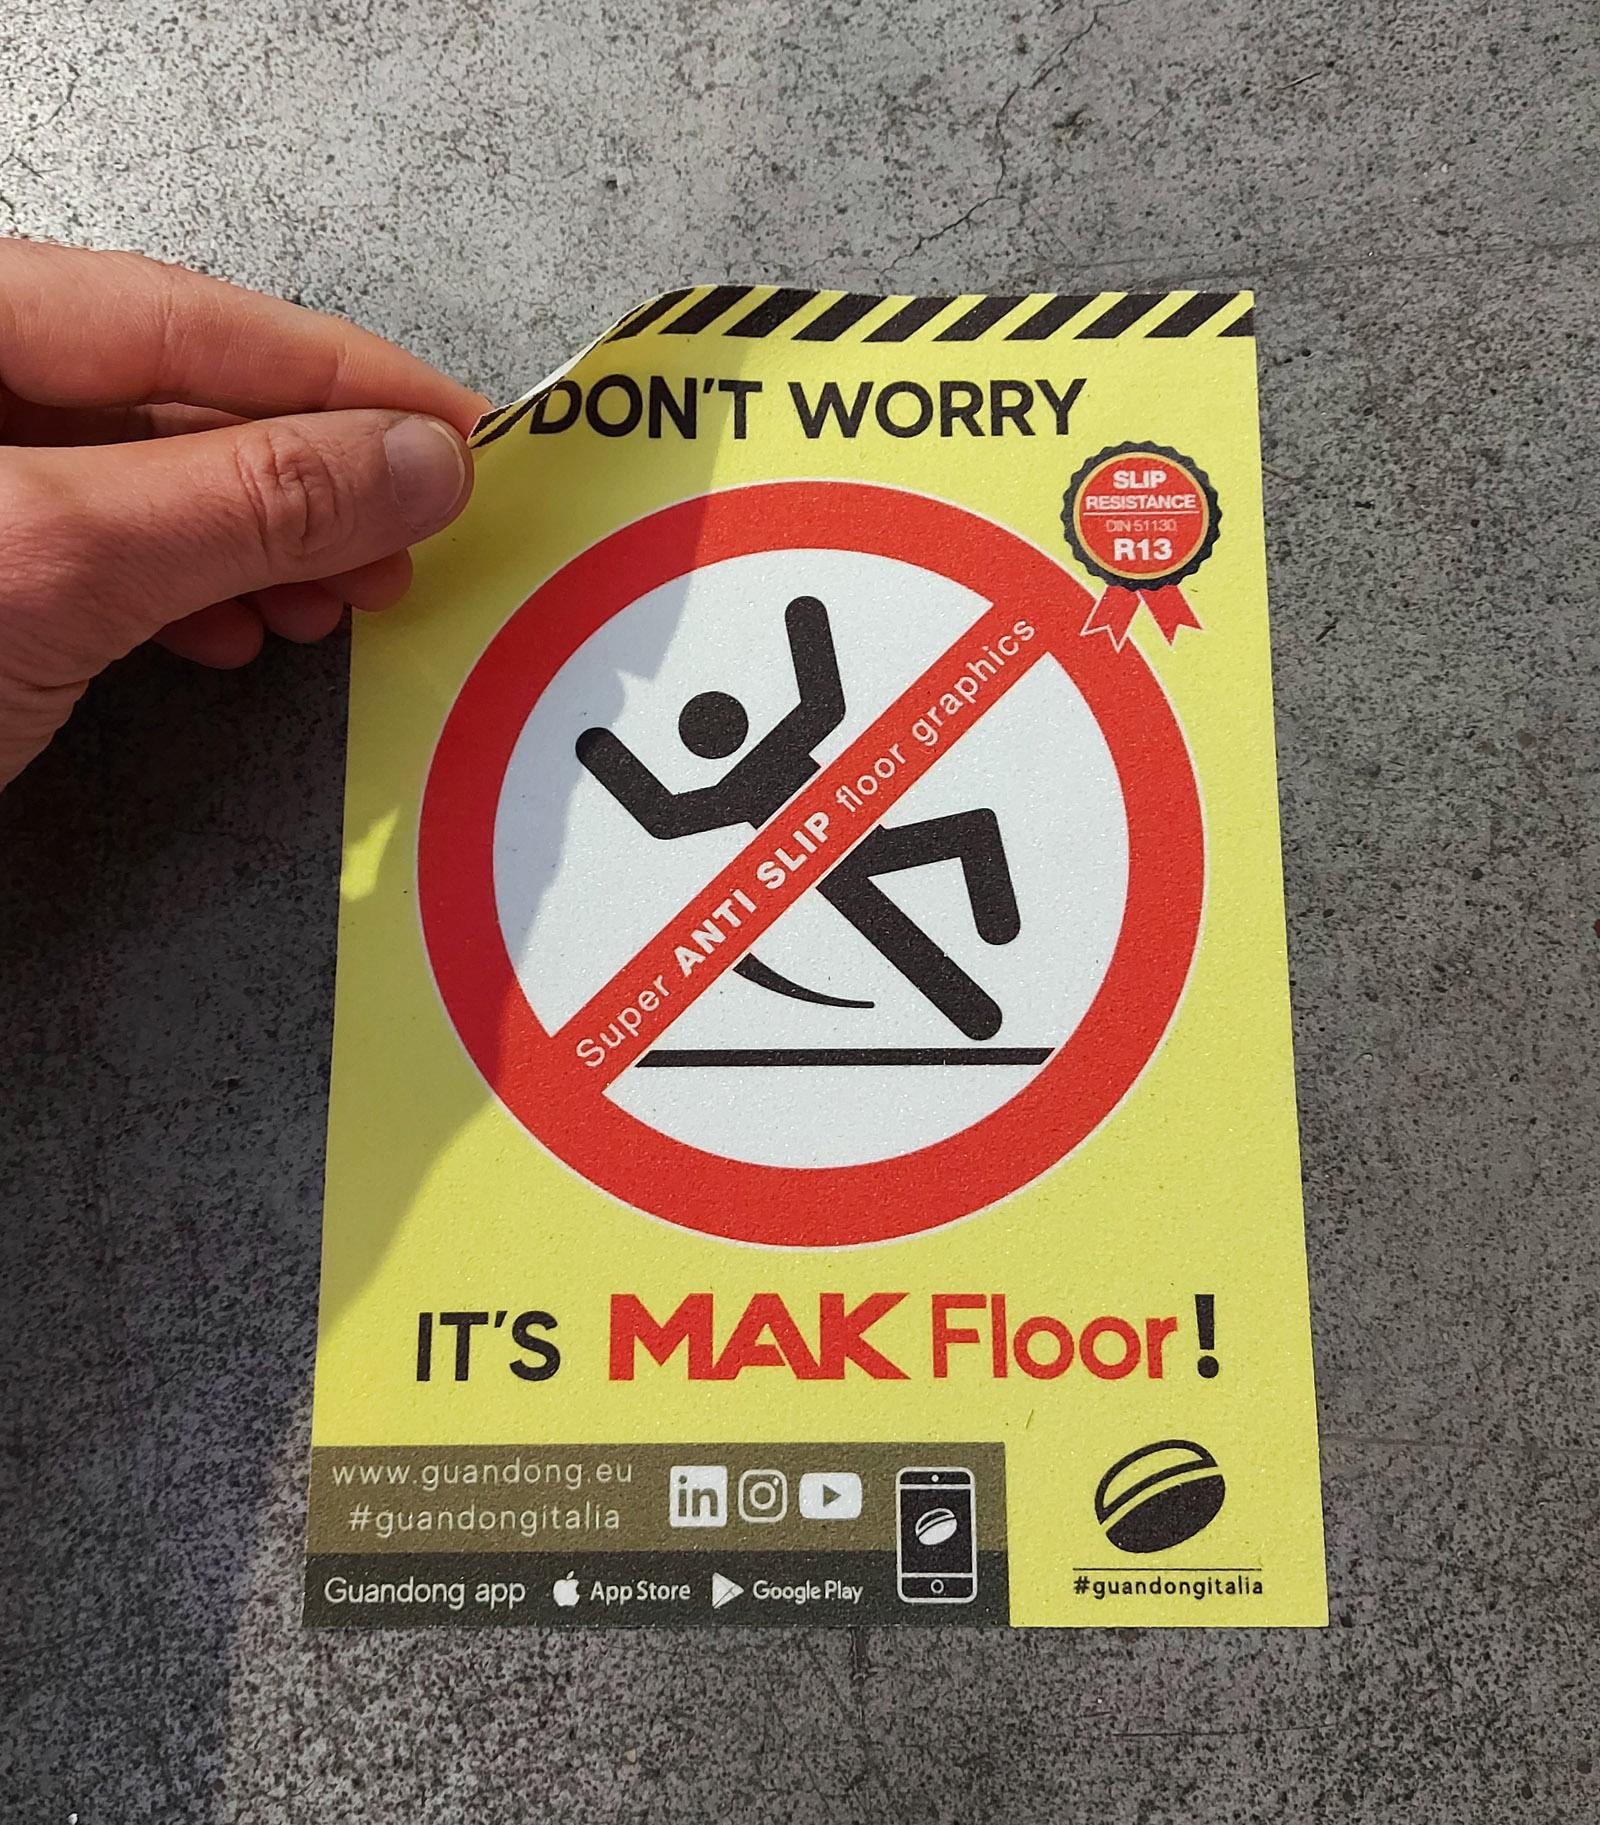 Mak Floor Guandong